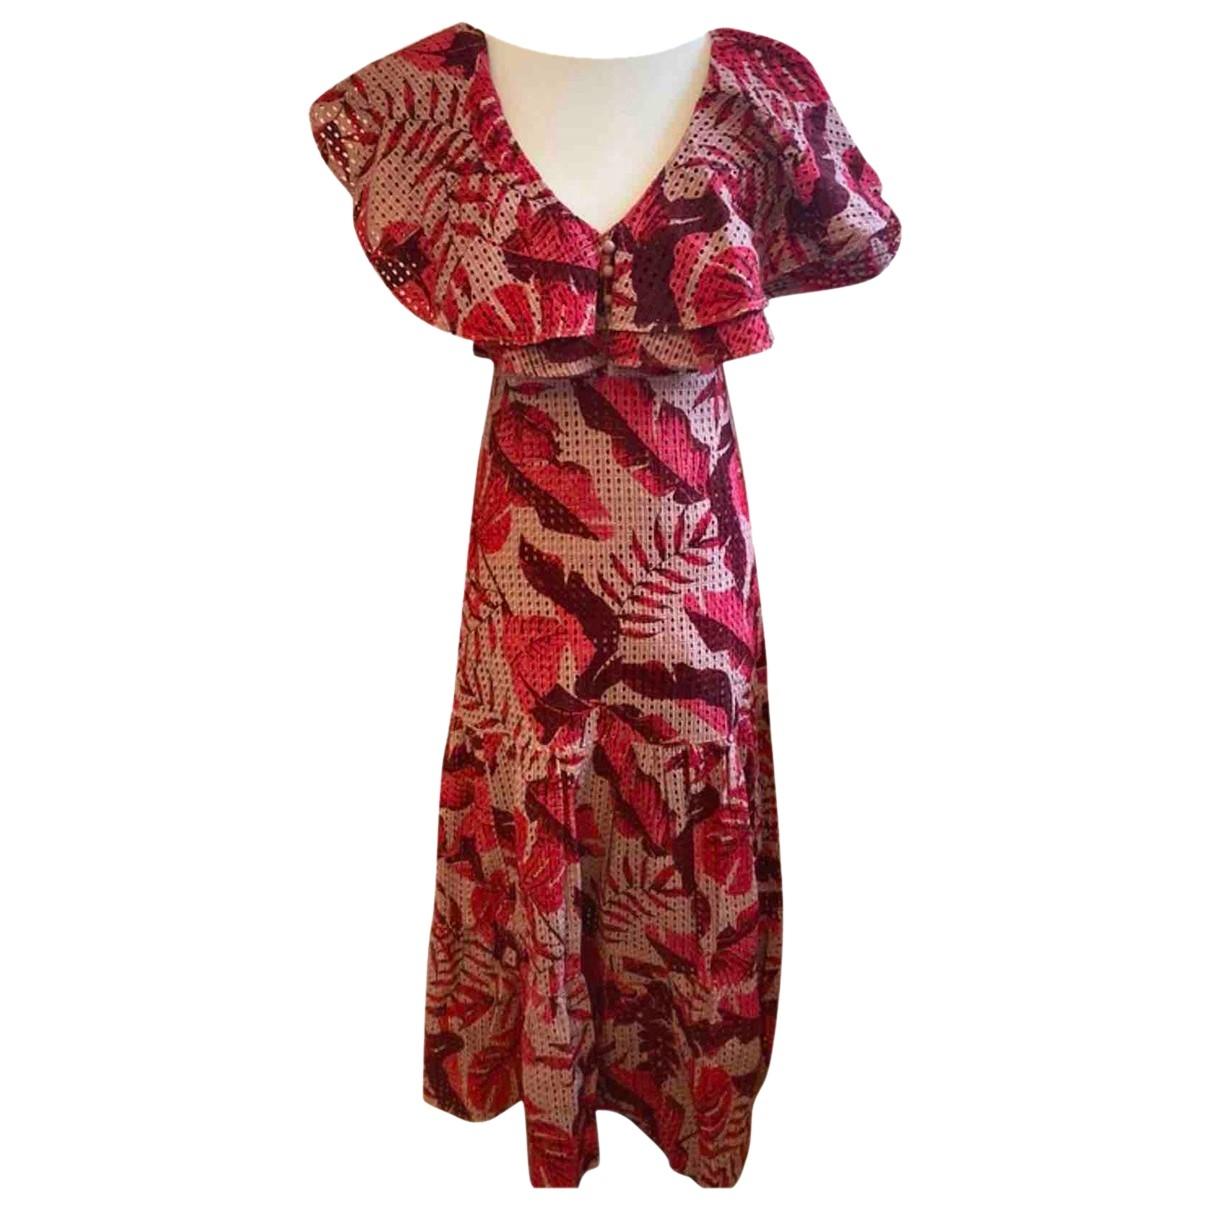 Maxi vestido Johanna Ortiz X H&m